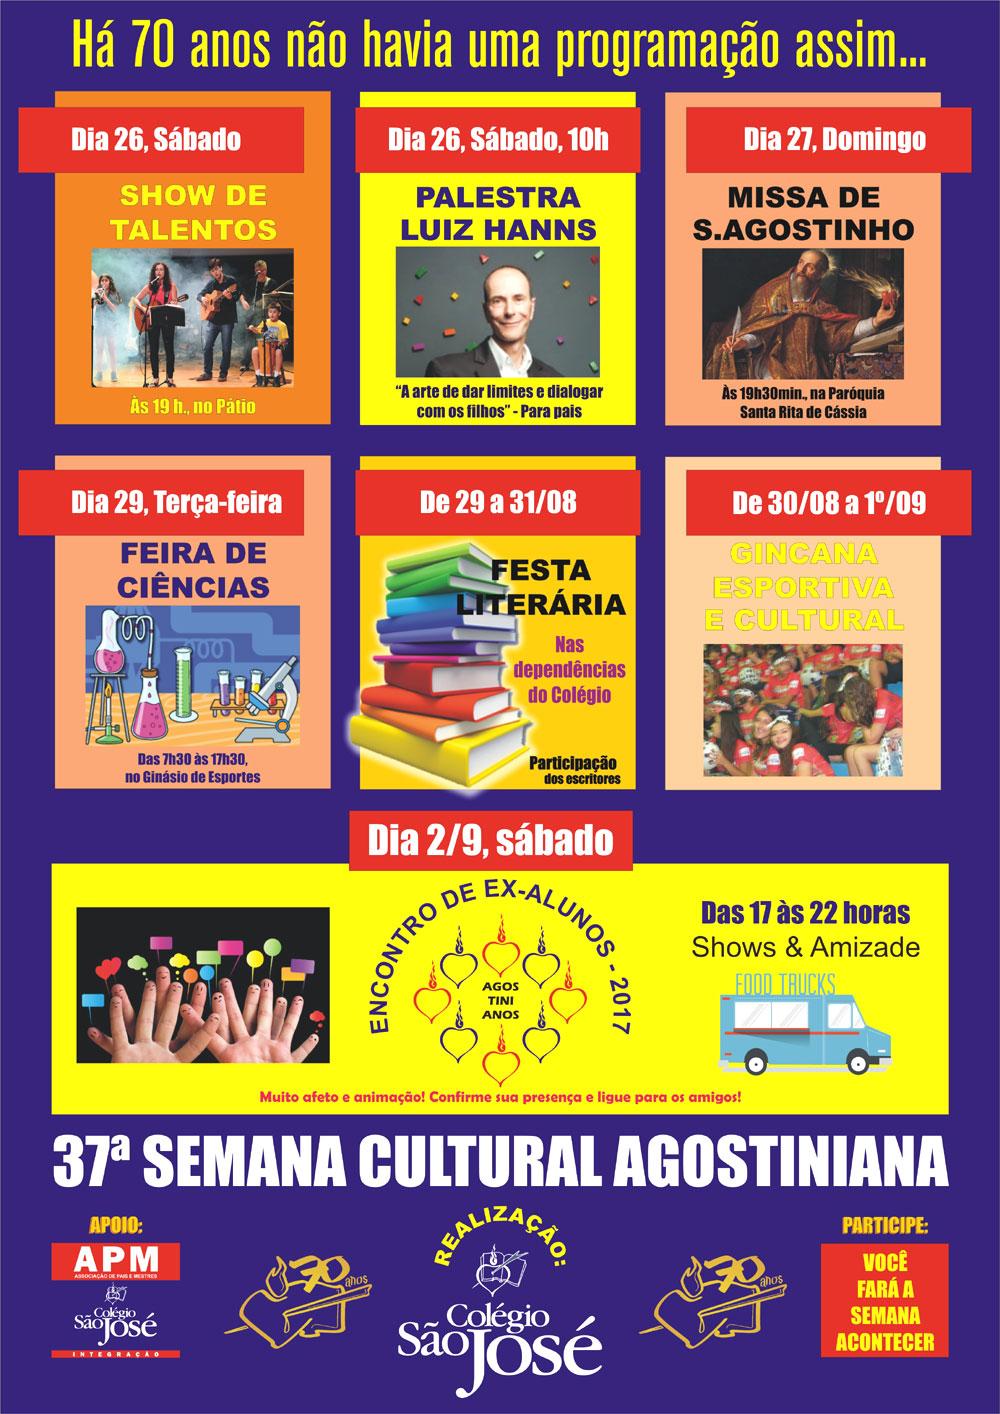 acont_SemanaAgostiniana_cartaz_20170811